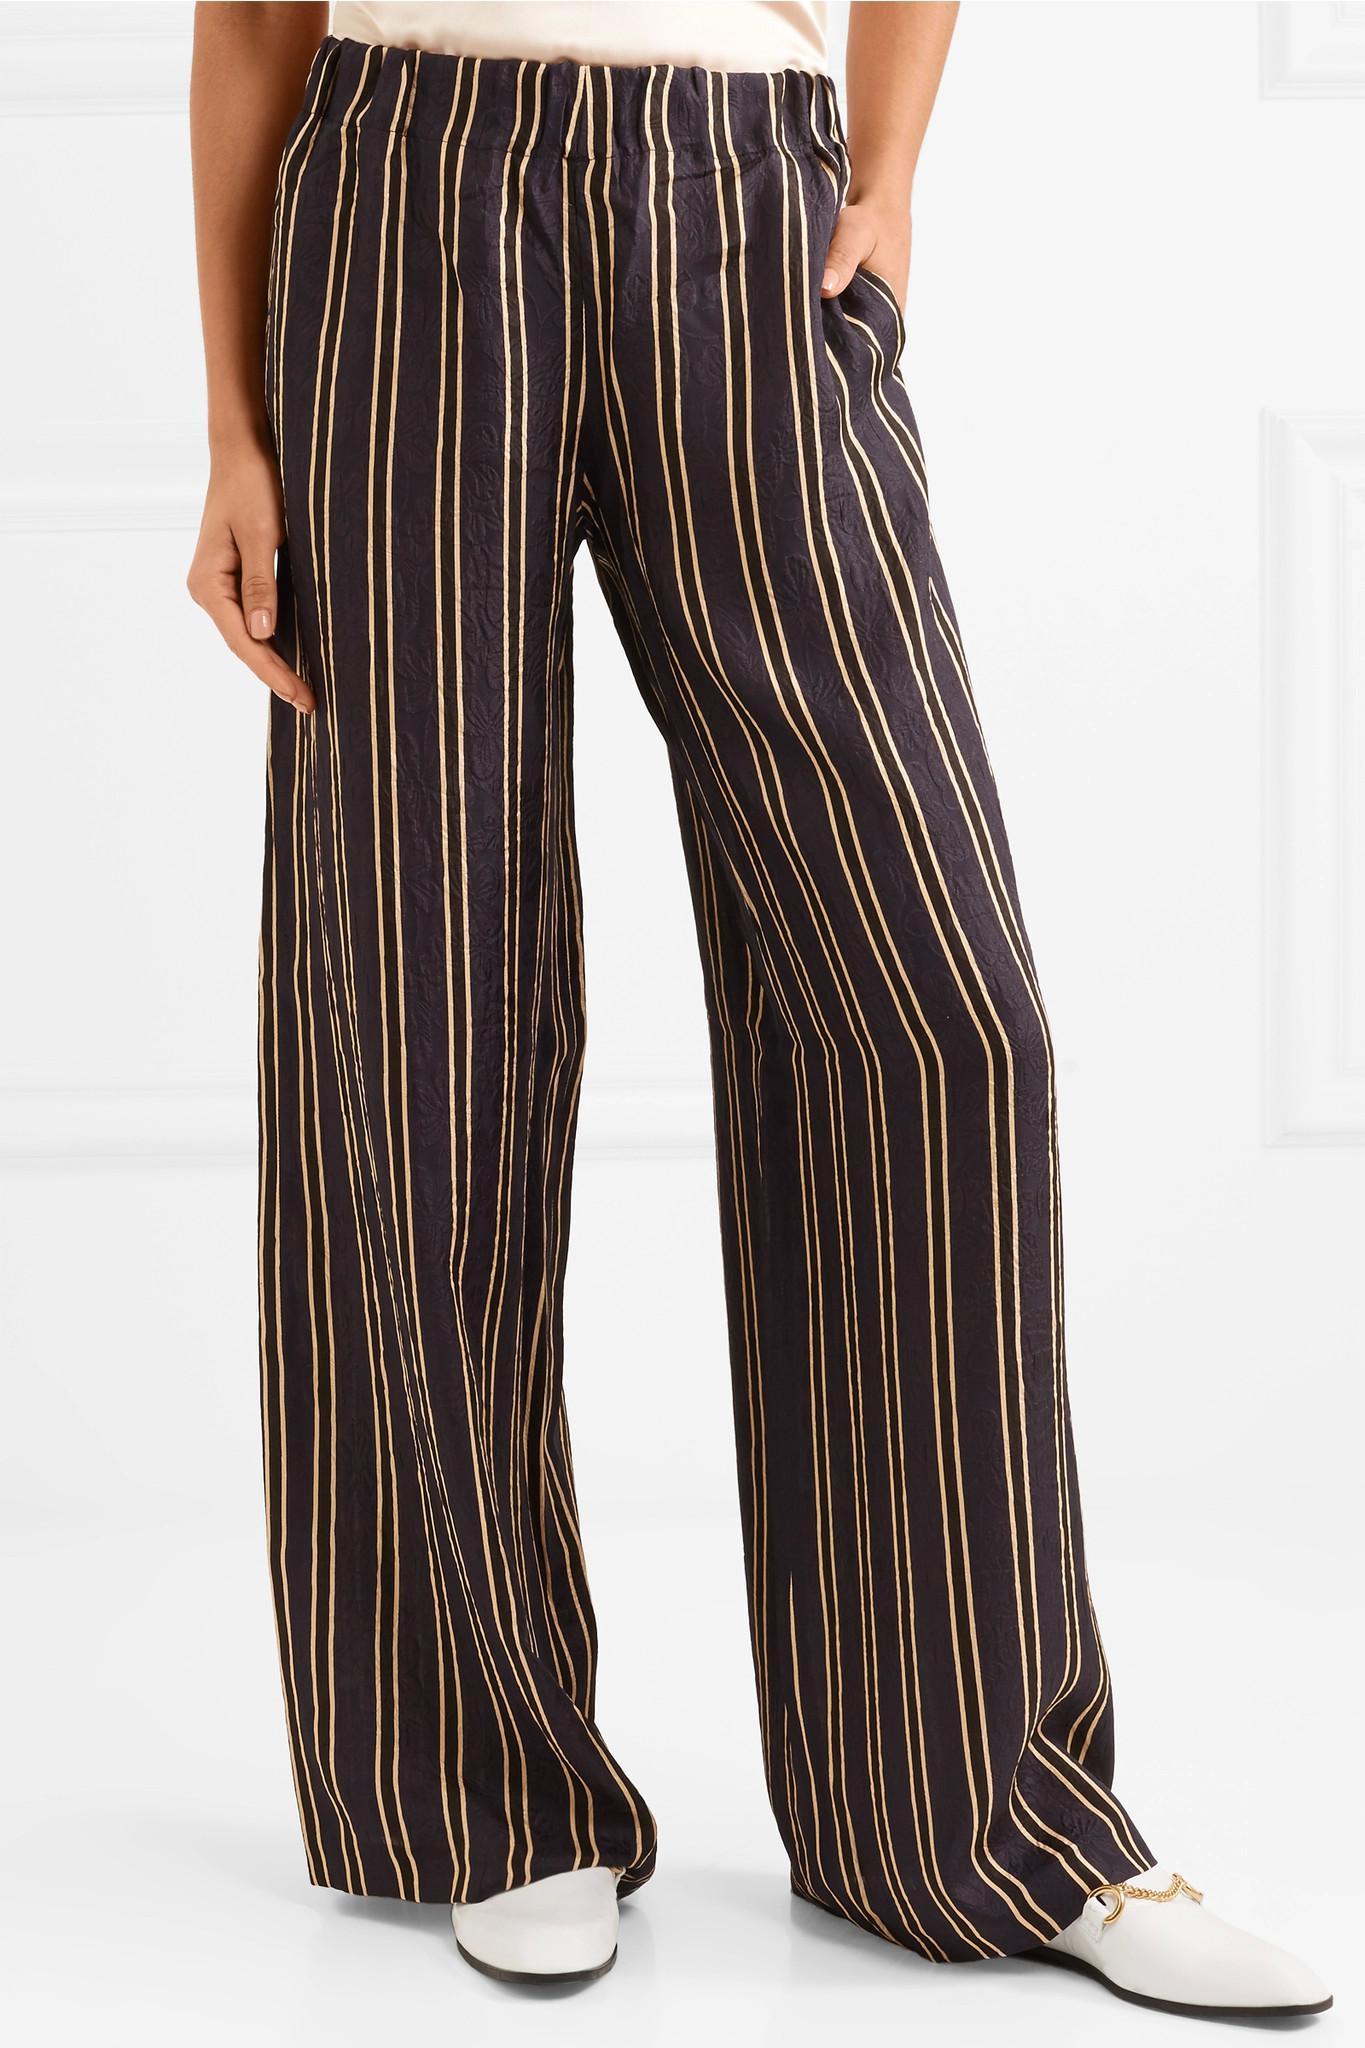 6c565f20e Paul & Joe Vertige Striped Crinkled-silk Crepe Wide-leg Pants in ...